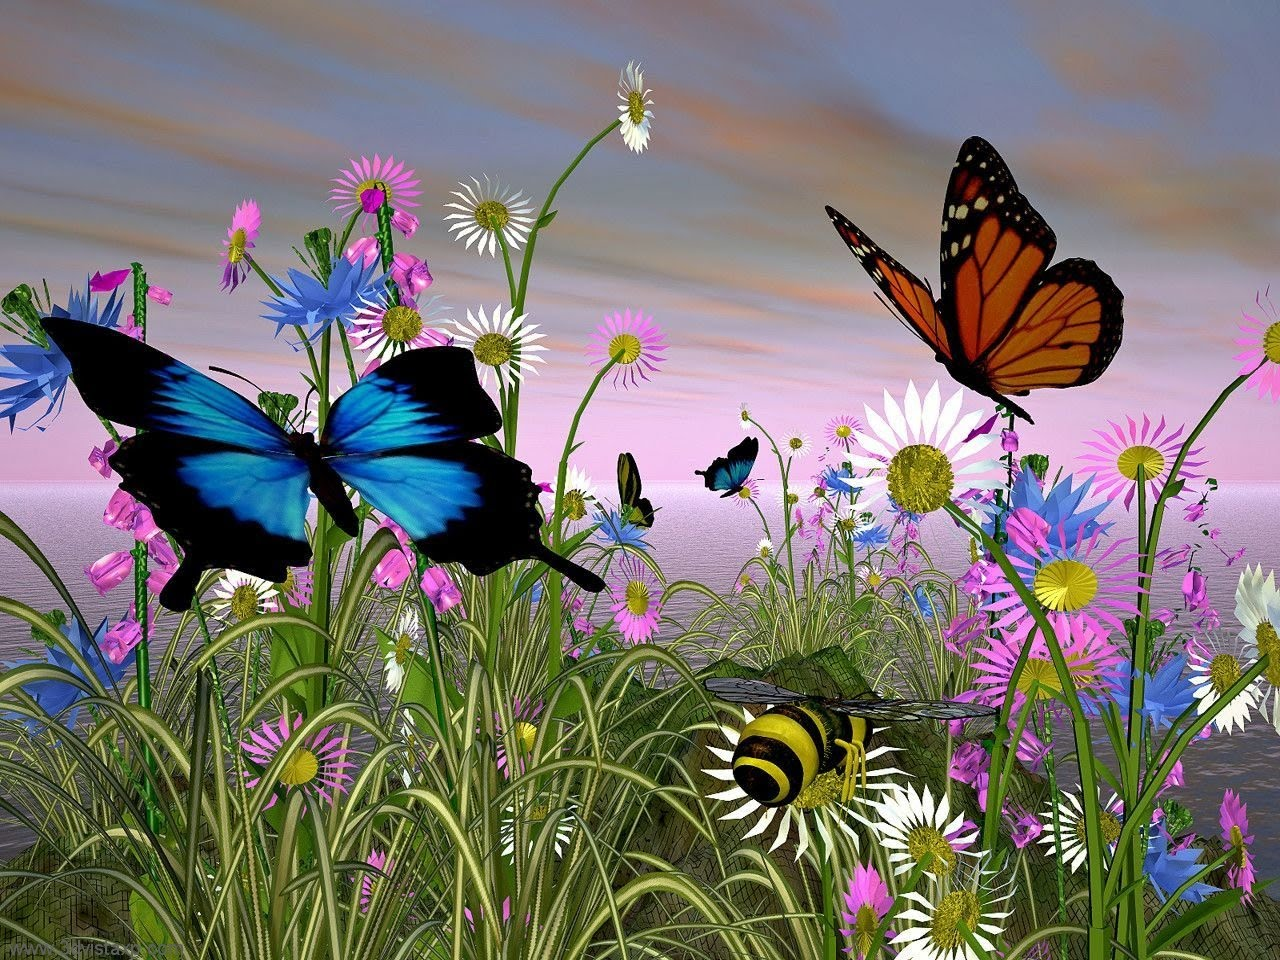 Caterpillar To Erfly